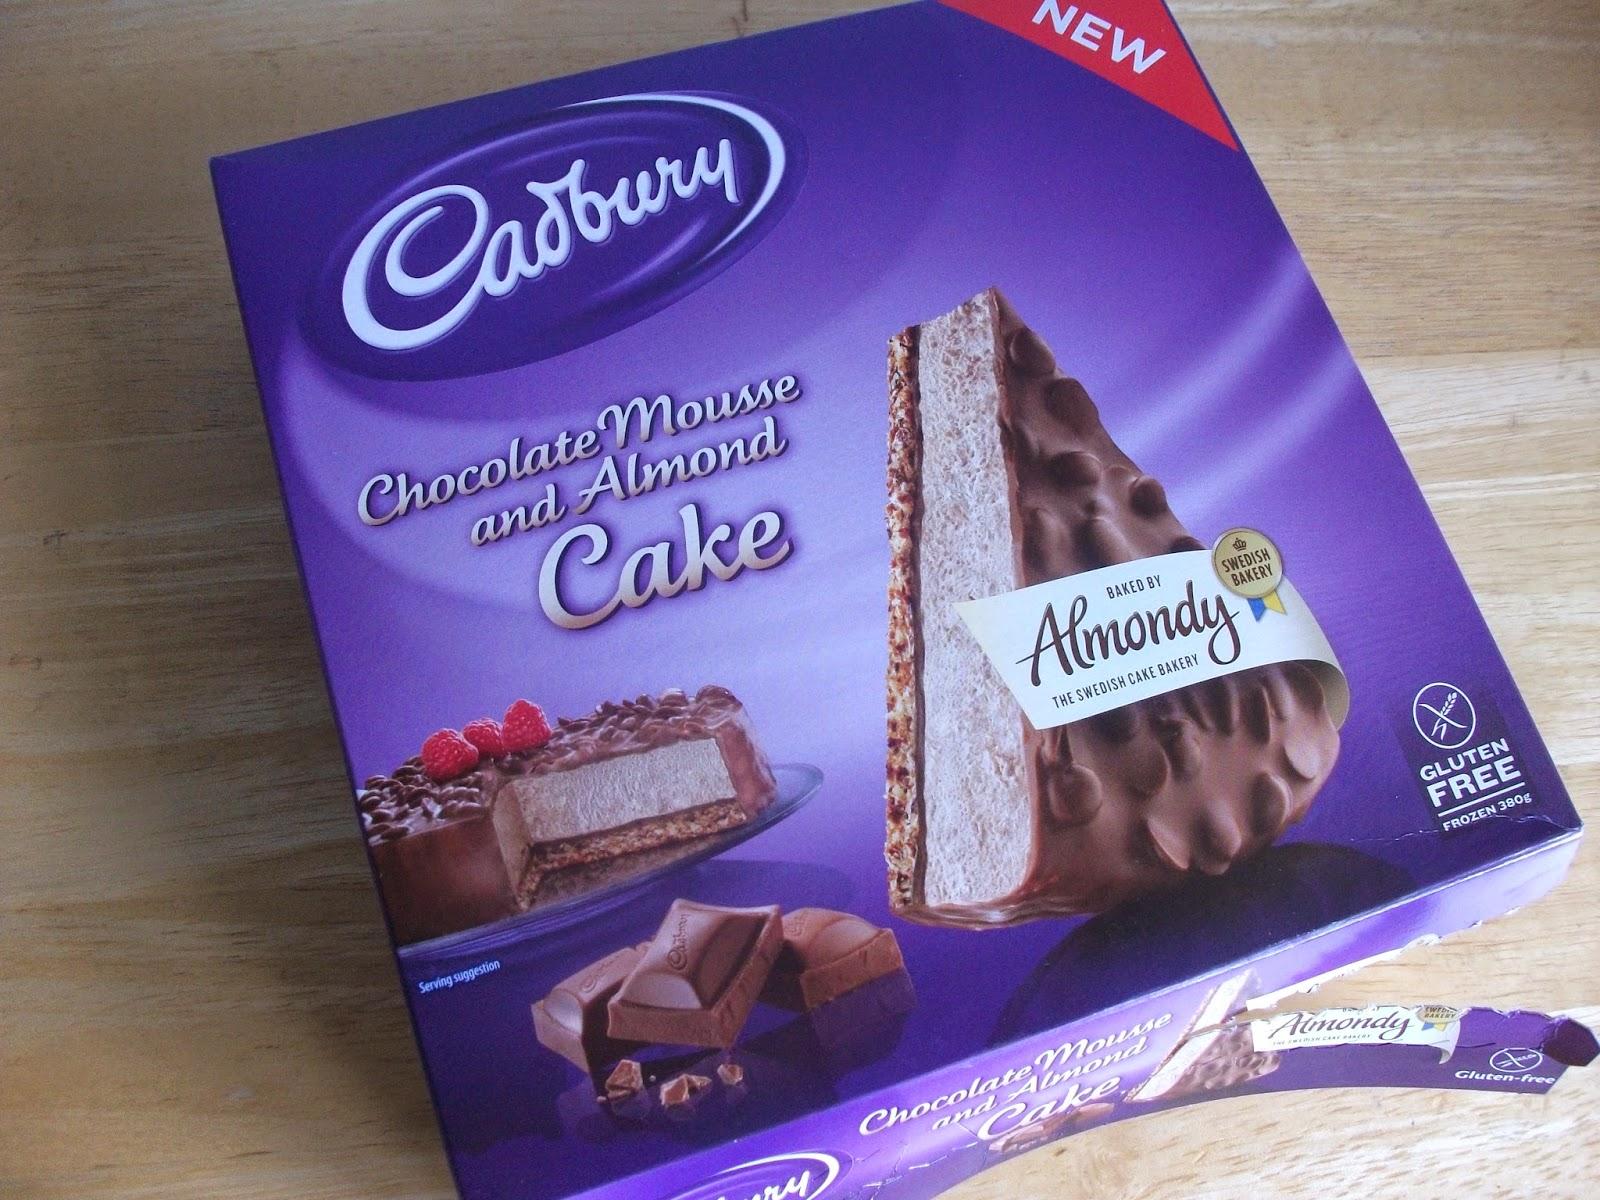 Cadbury Almondy Chocolate Mousse & Almond Cake (Gluten Free) Almondy